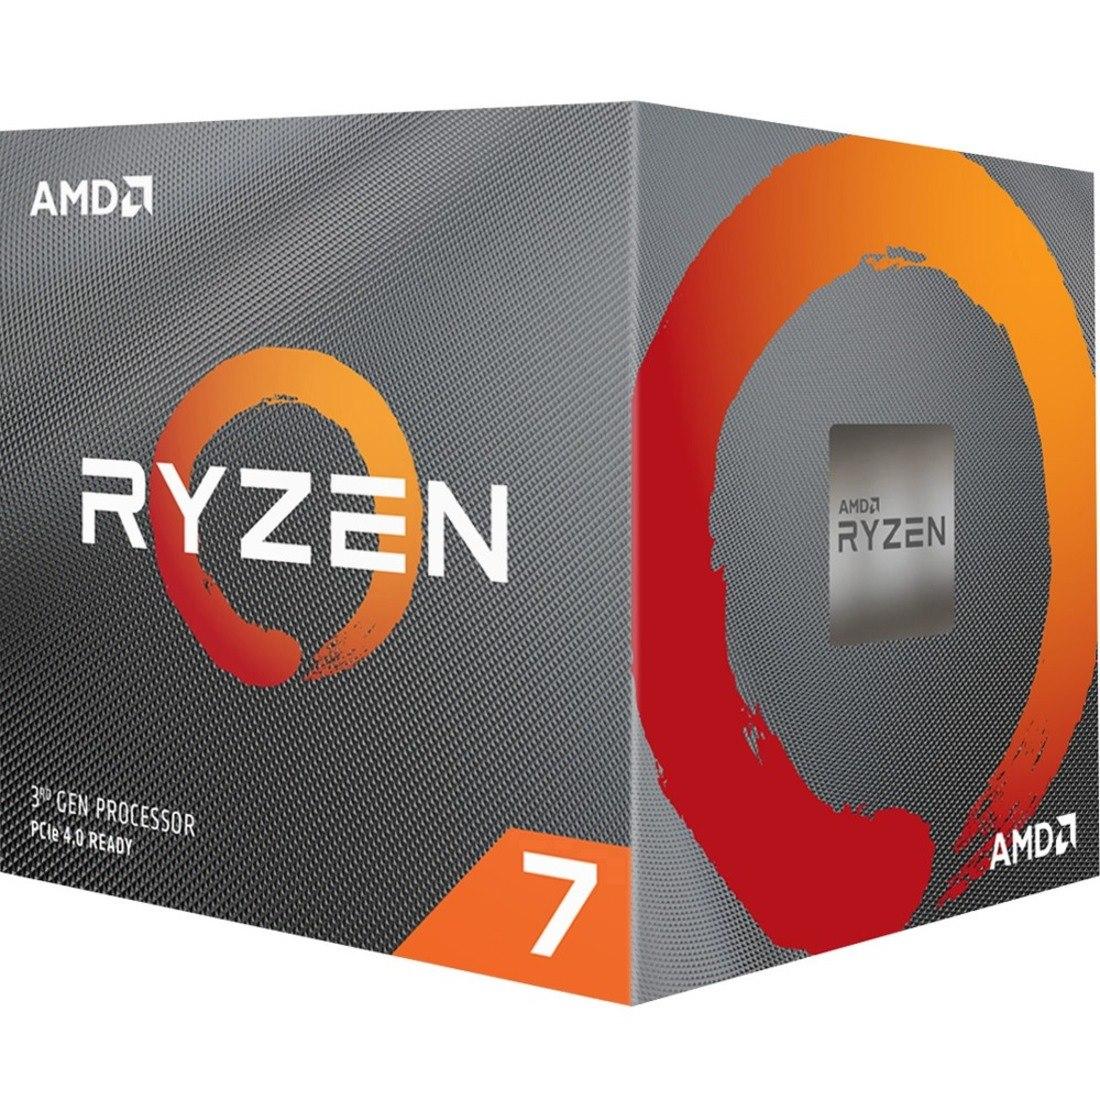 AMD Ryzen 7 3700X Octa-core (8 Core) 3.60 GHz Processor - Retail Pack